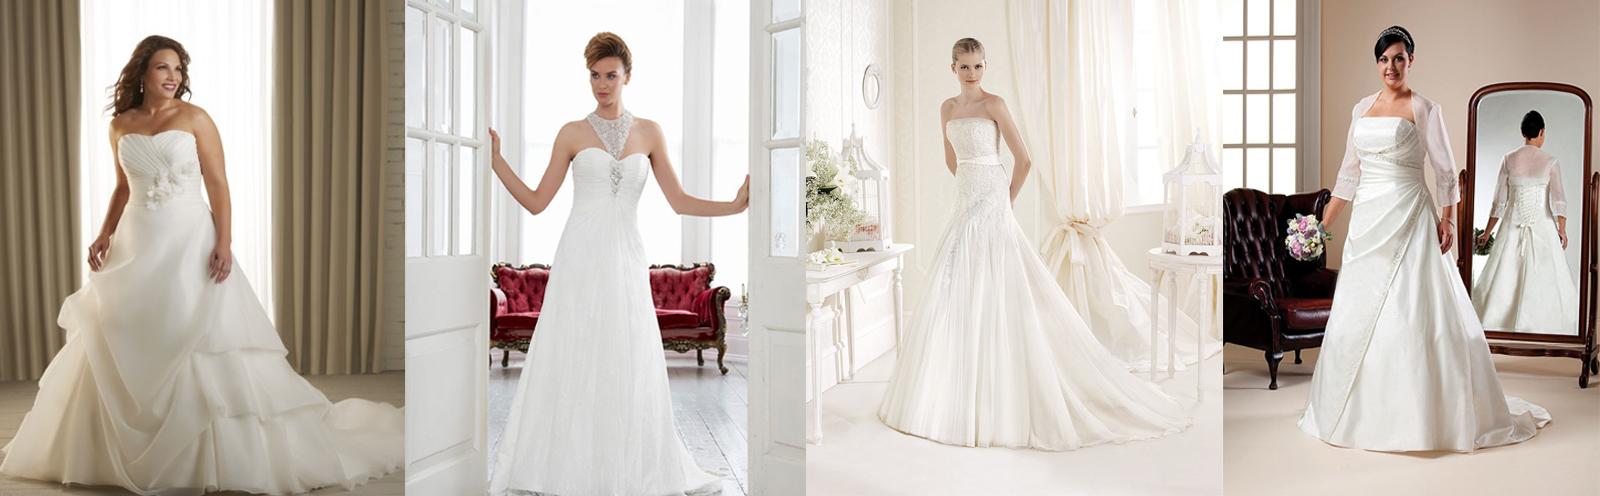 Amore Plus Bridal Wear